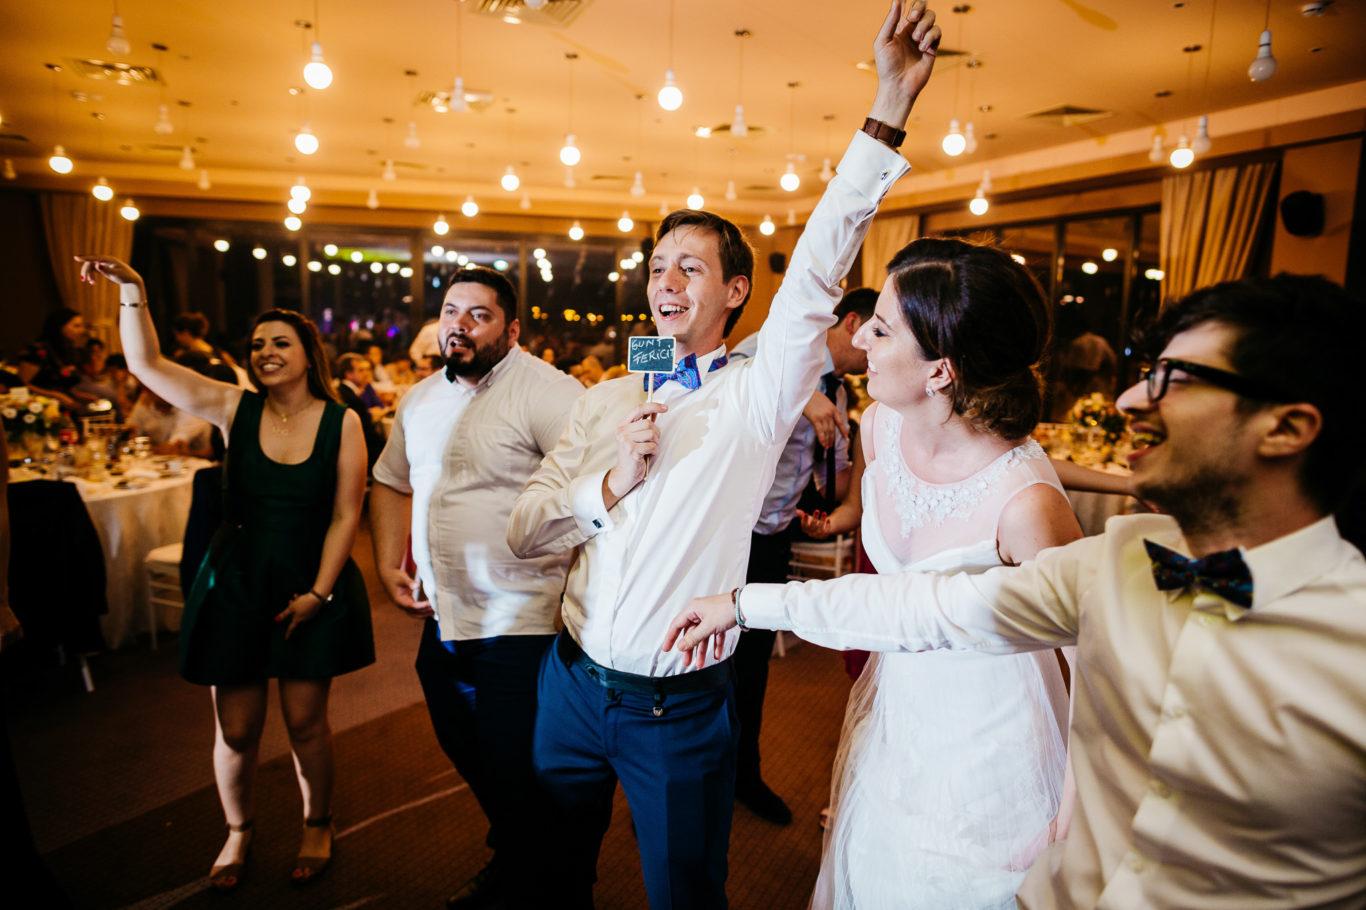 0909-Fotografie-nunta-Bucuresti-Oana-Catalin-fotograf-Ciprian-Dumitrescu-DCF_3118